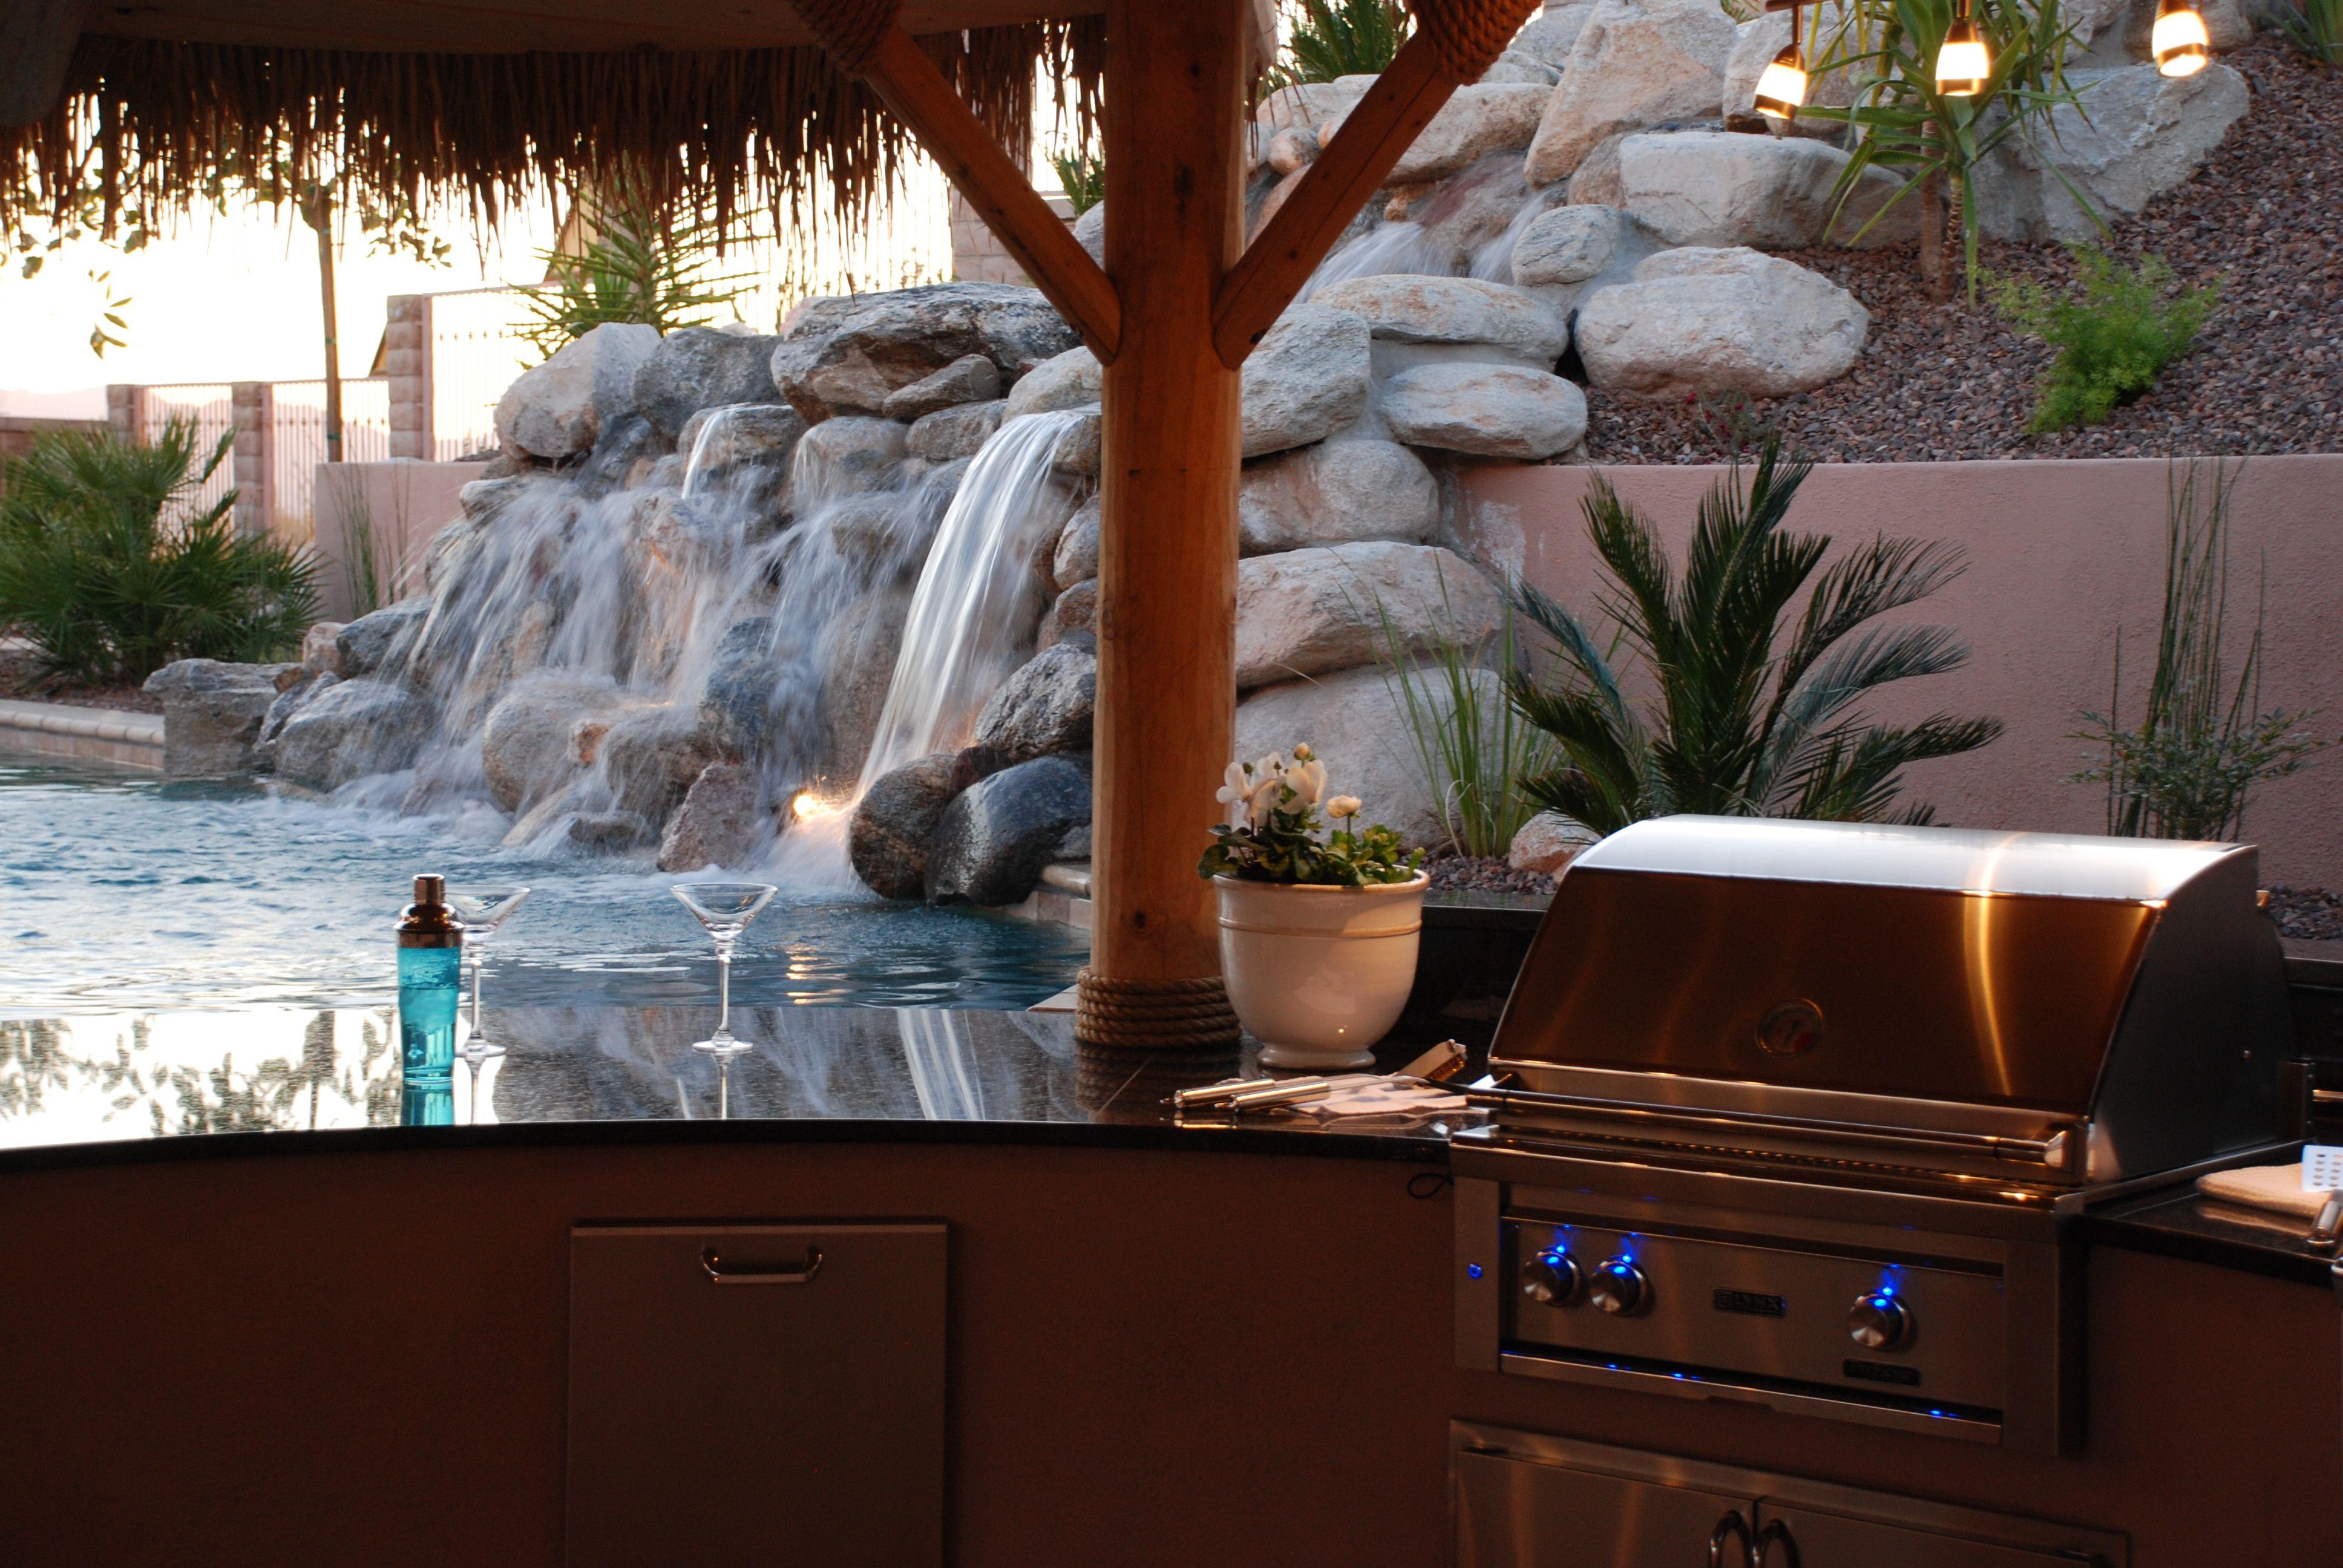 Landscape Lighting, Outdoor Lighting, Tucson, Outdoor Kitchens, Exterior  Lighting, Outdoor Cooking